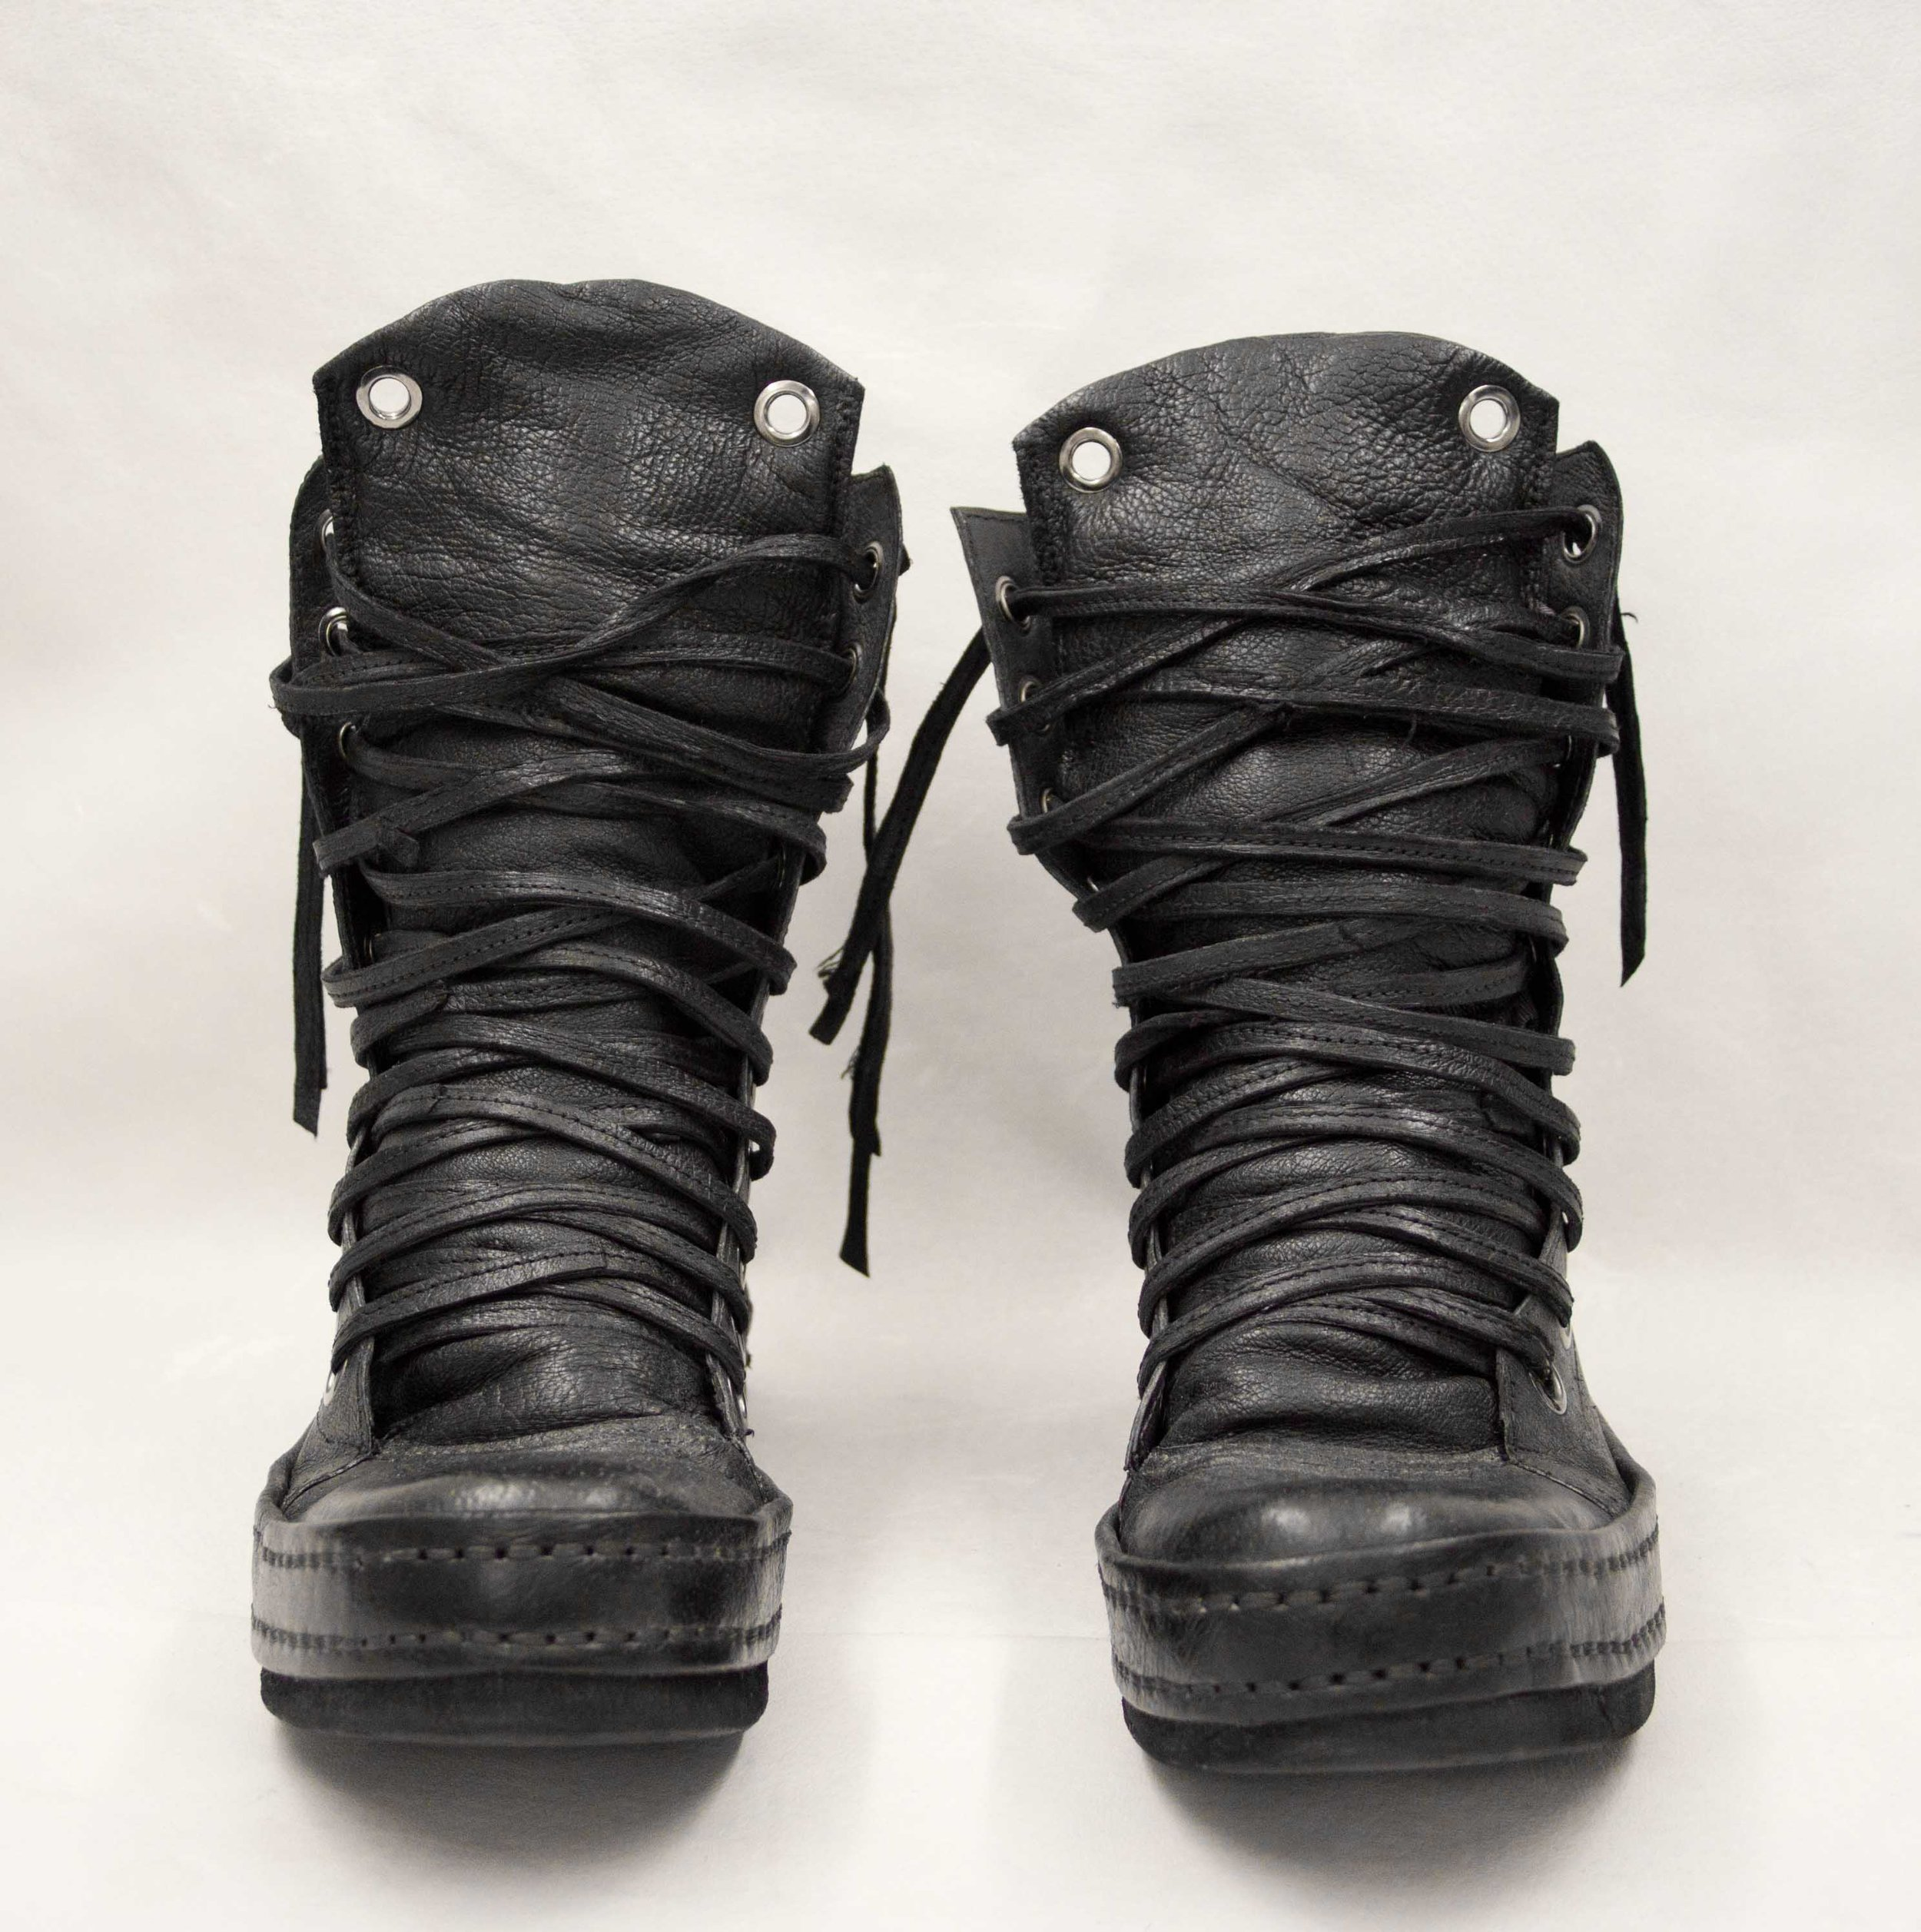 2012 10Hole Waxed Black